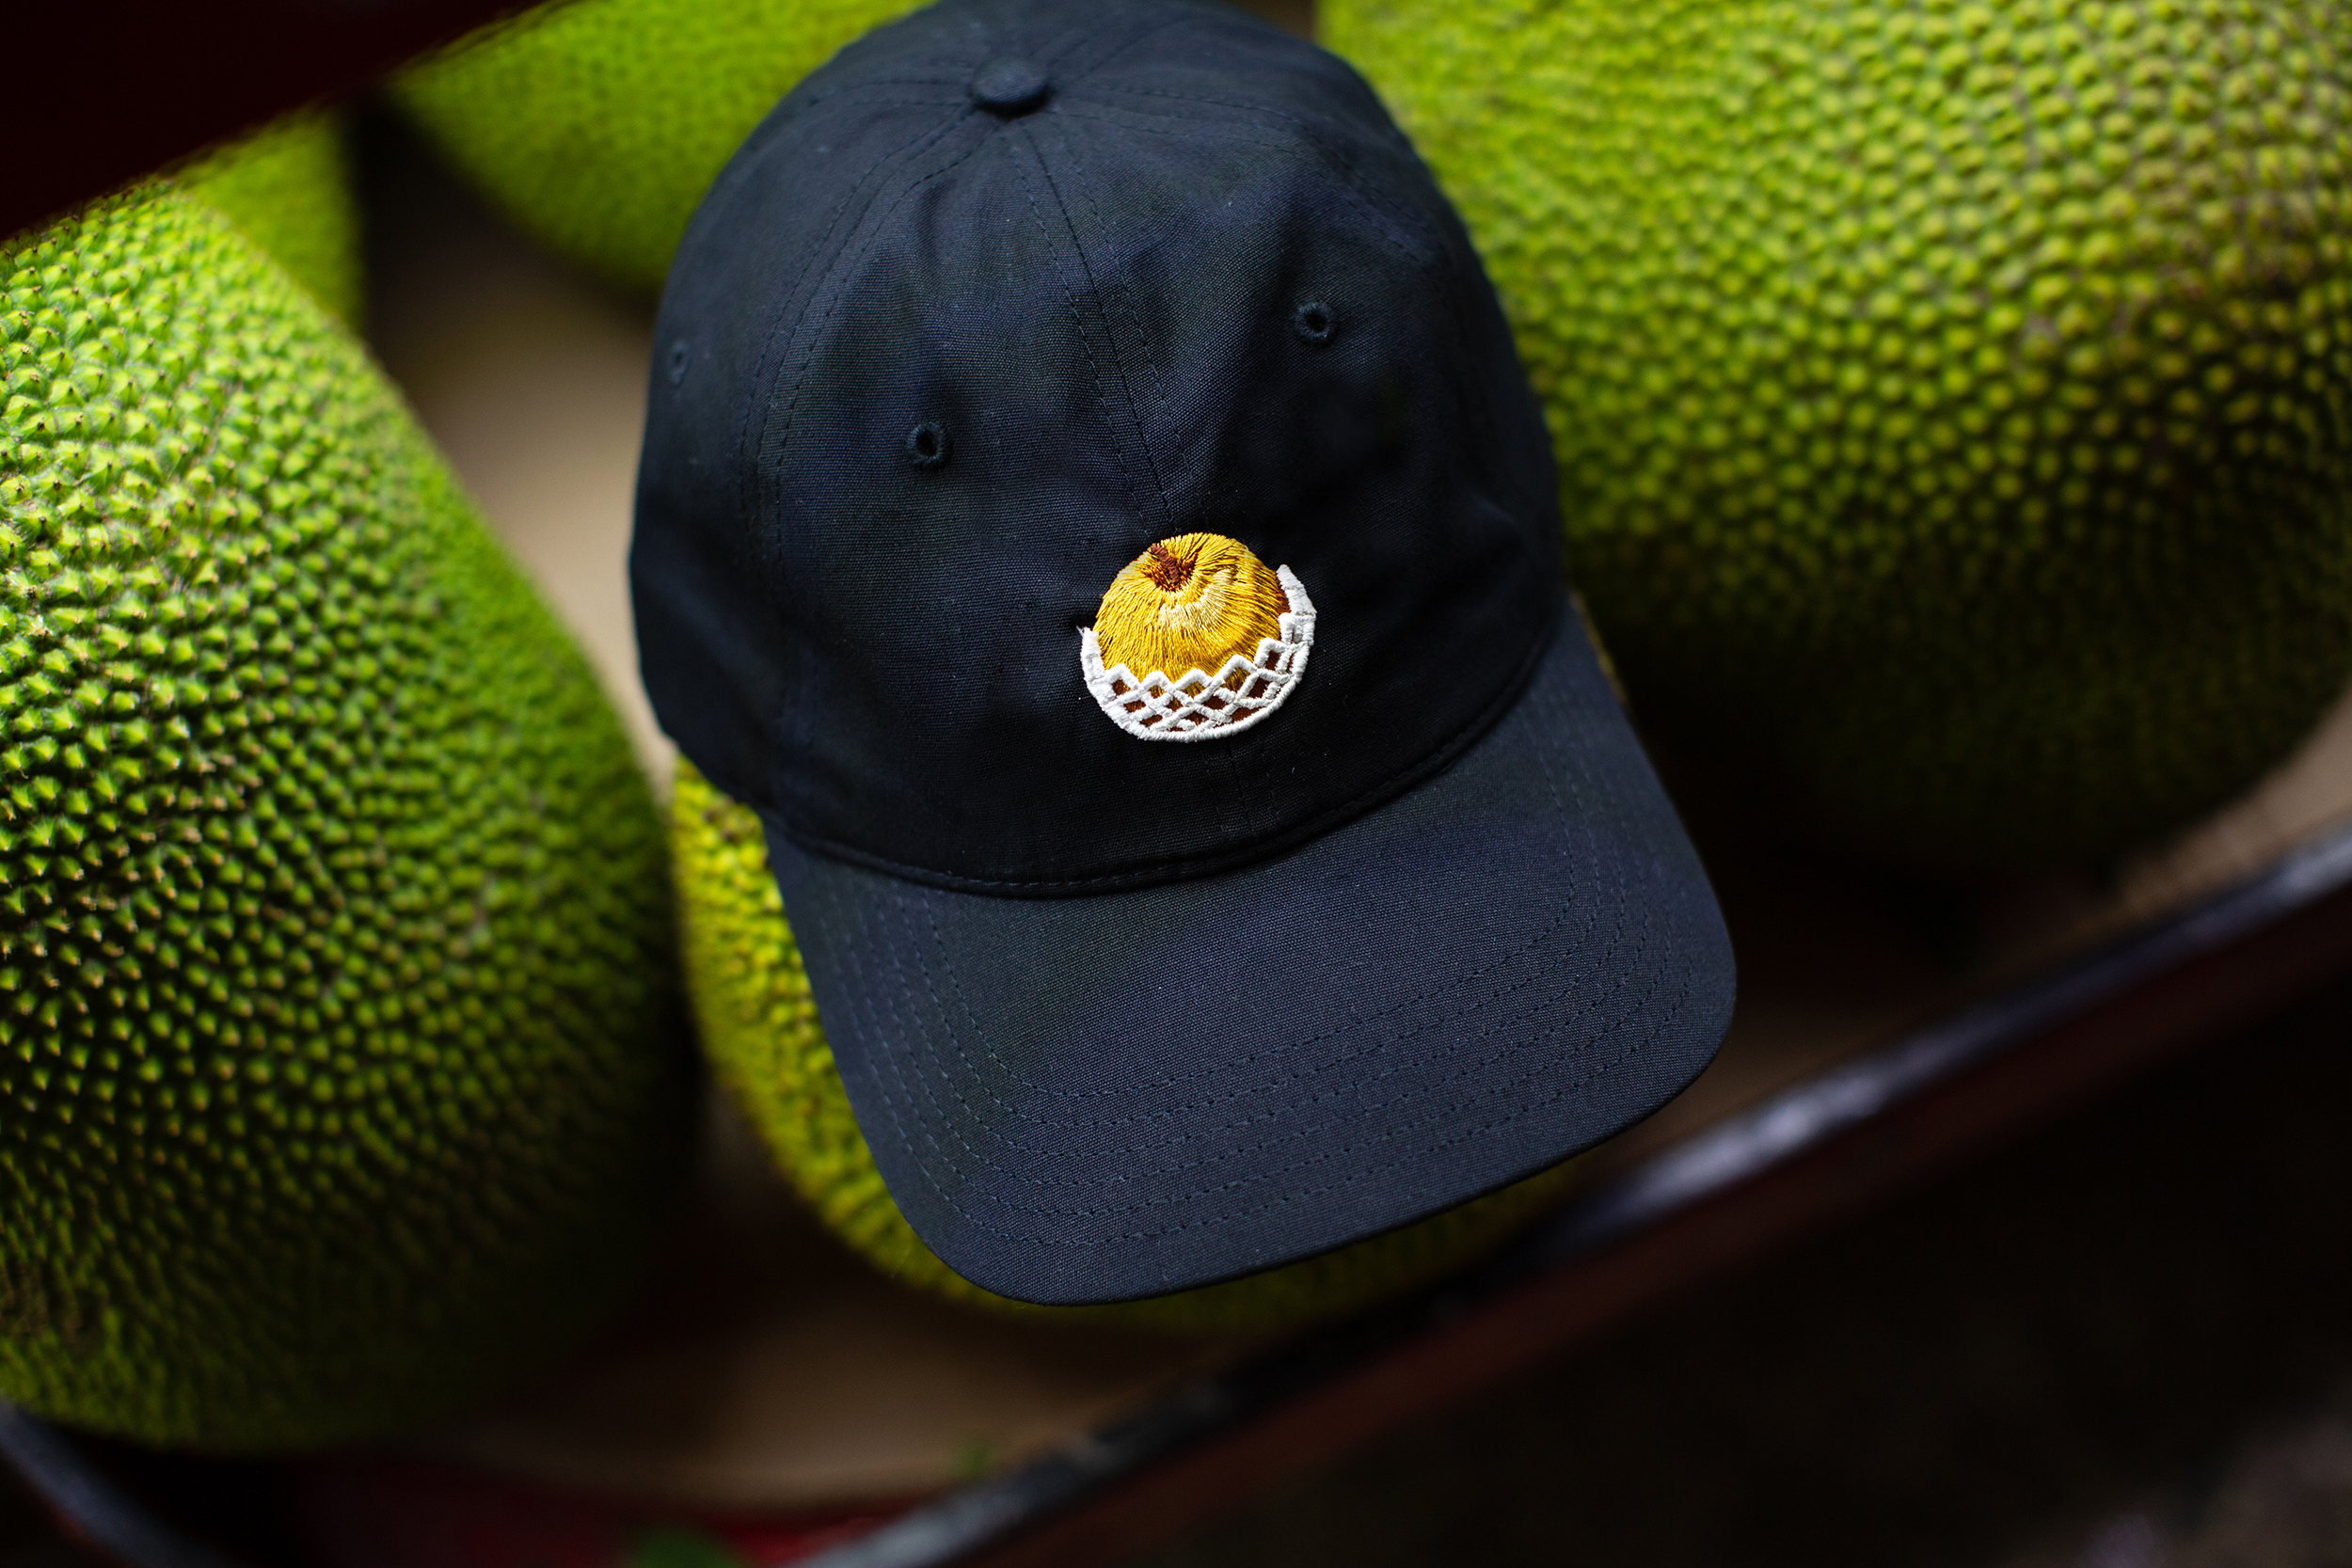 nyc-jackfruit-hat.jpg